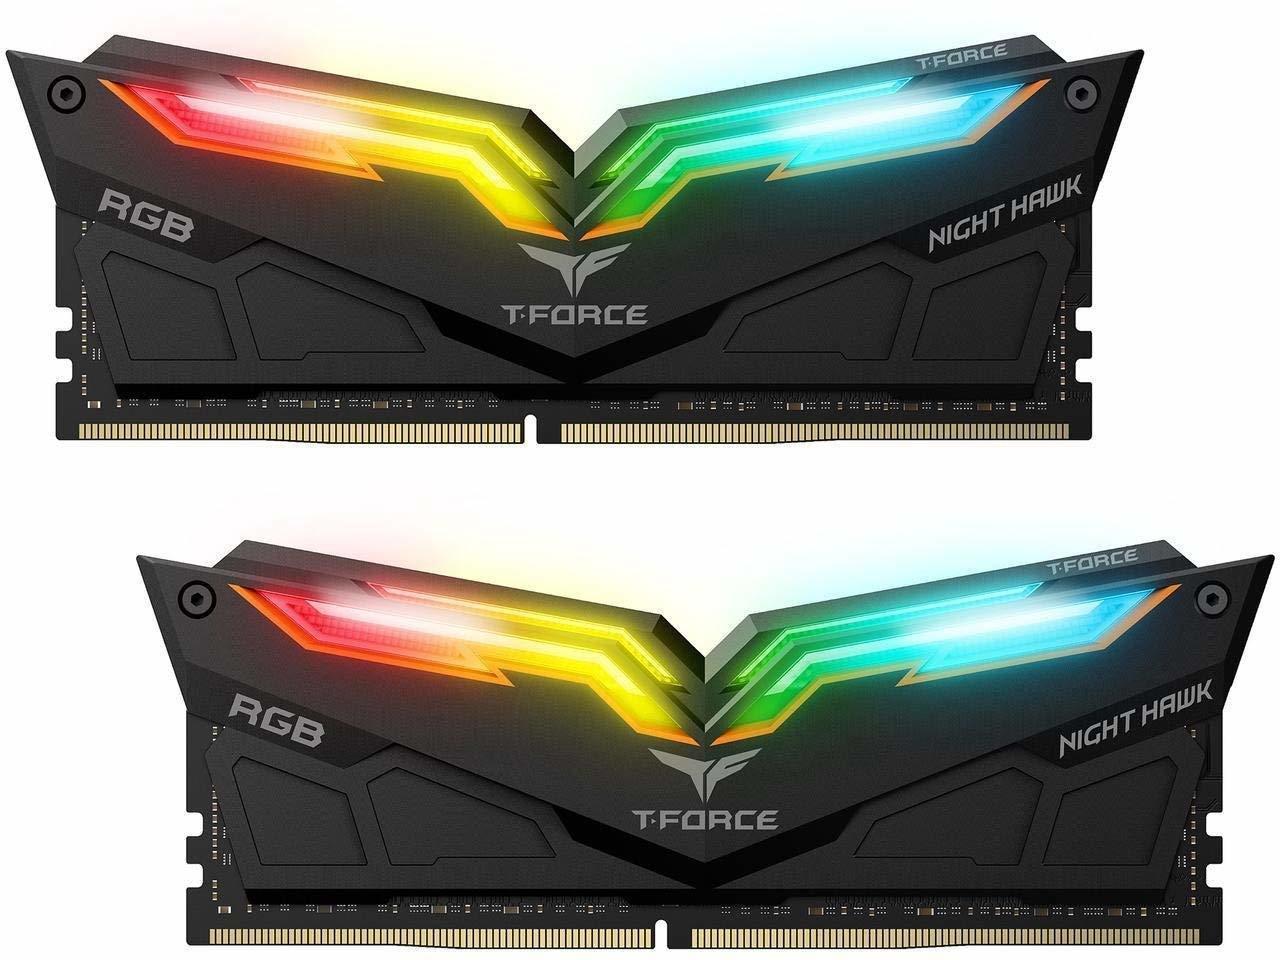 2x8GB Team T-Force Night Hawk RGB 3000MHz DDR4 Gaming RAM image